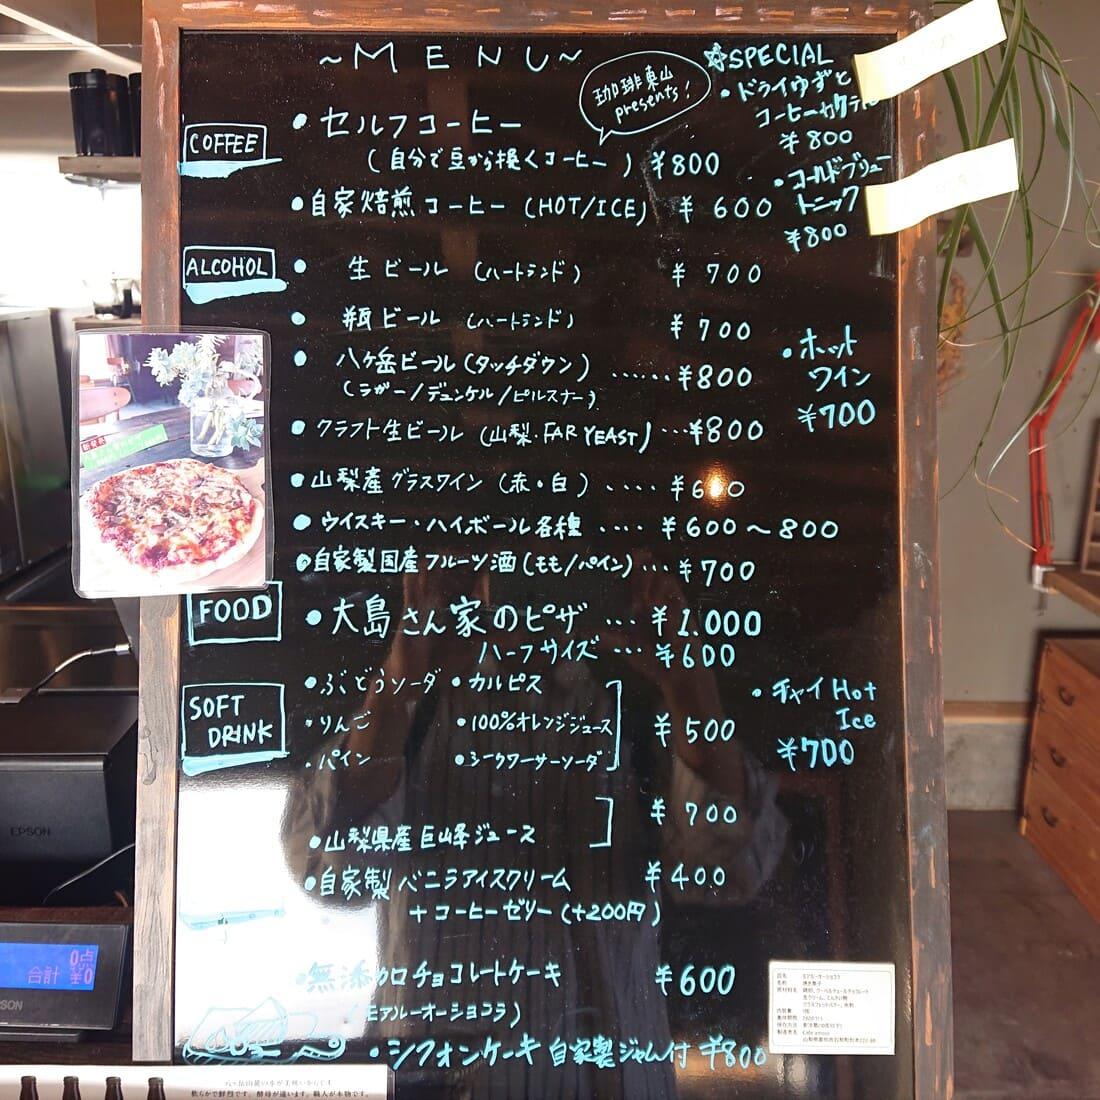 CAFE 山歩のメインメニュー